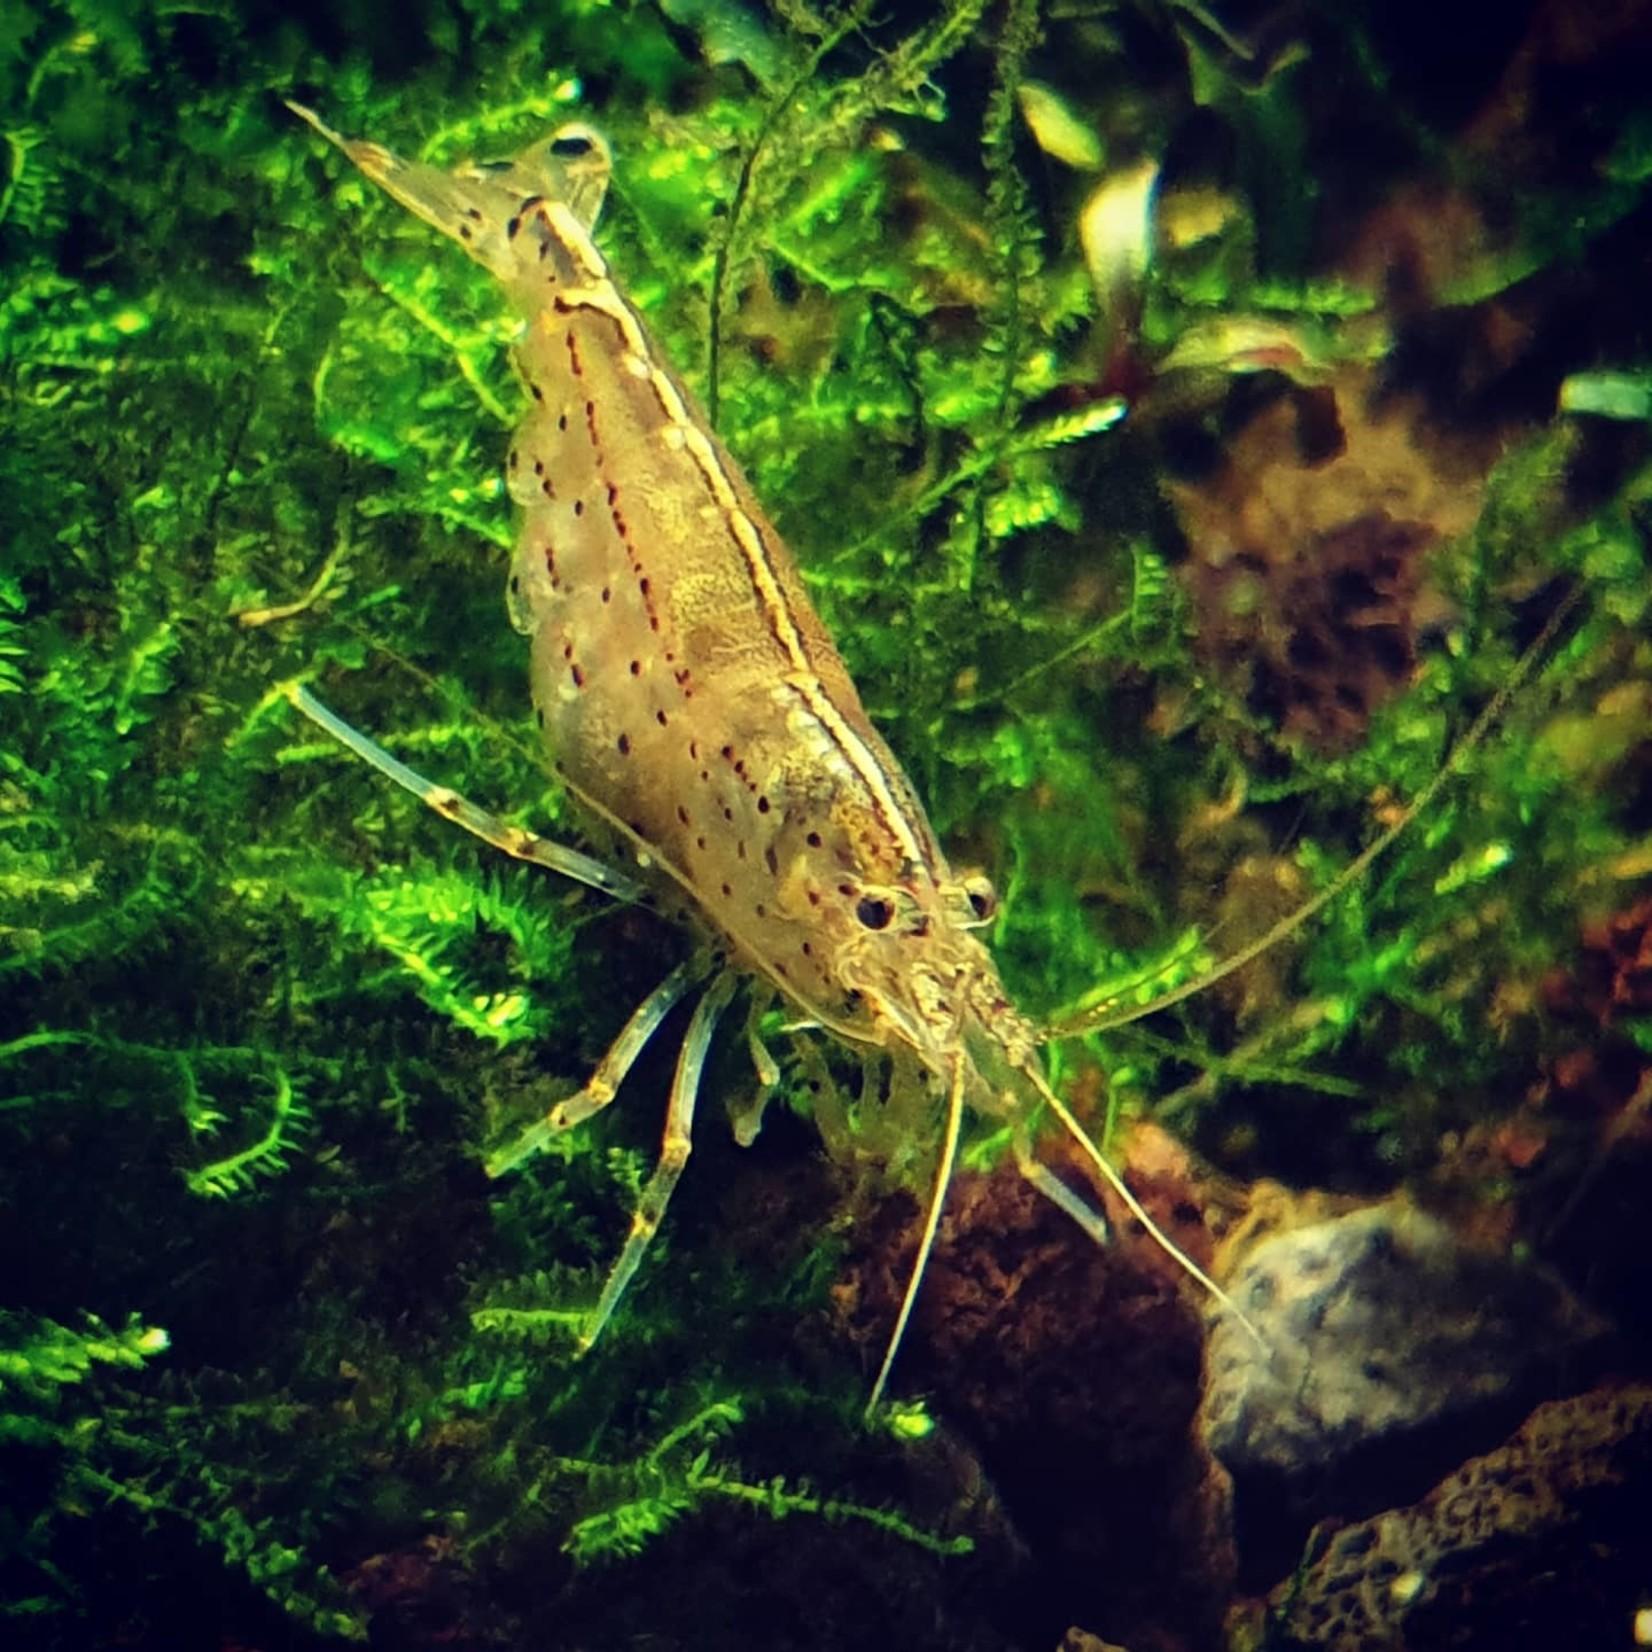 Bubba's Shrimps Caridina multidentata - Japonica - Amano Shrimps